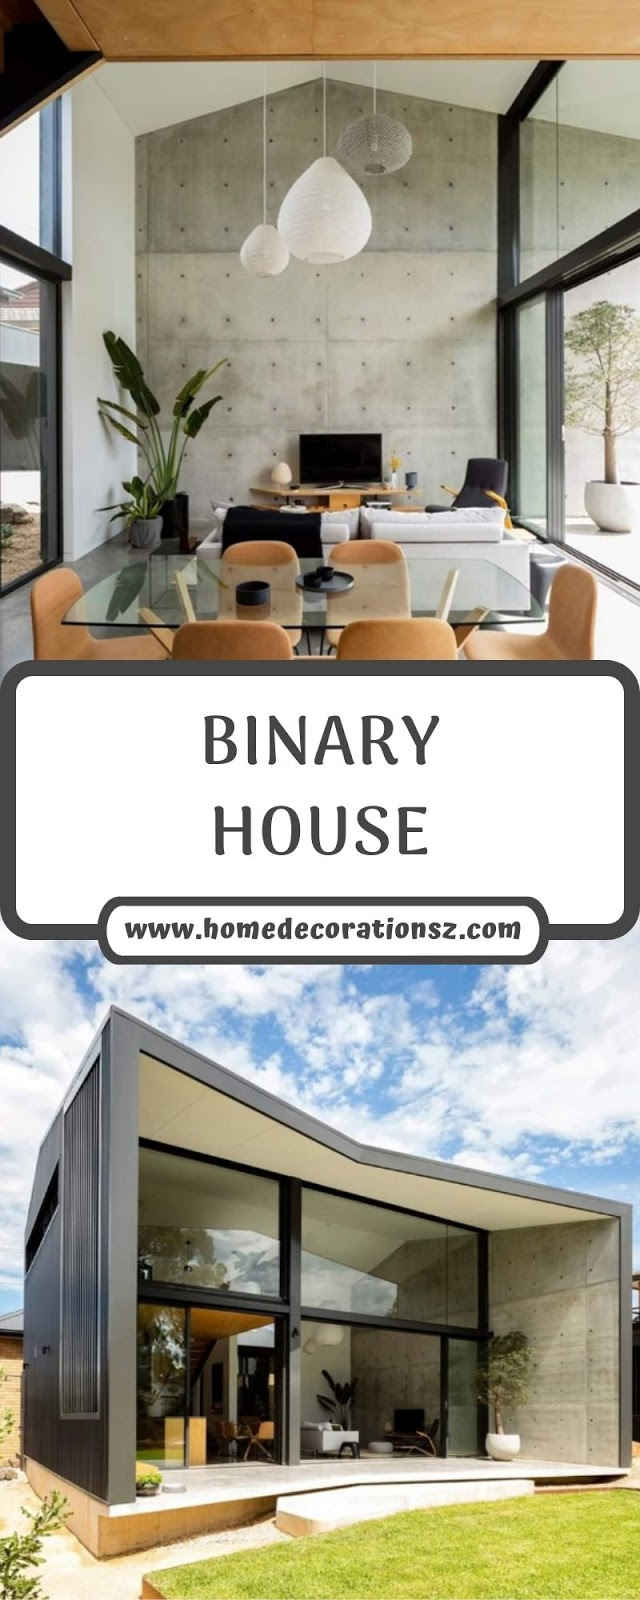 Binary House